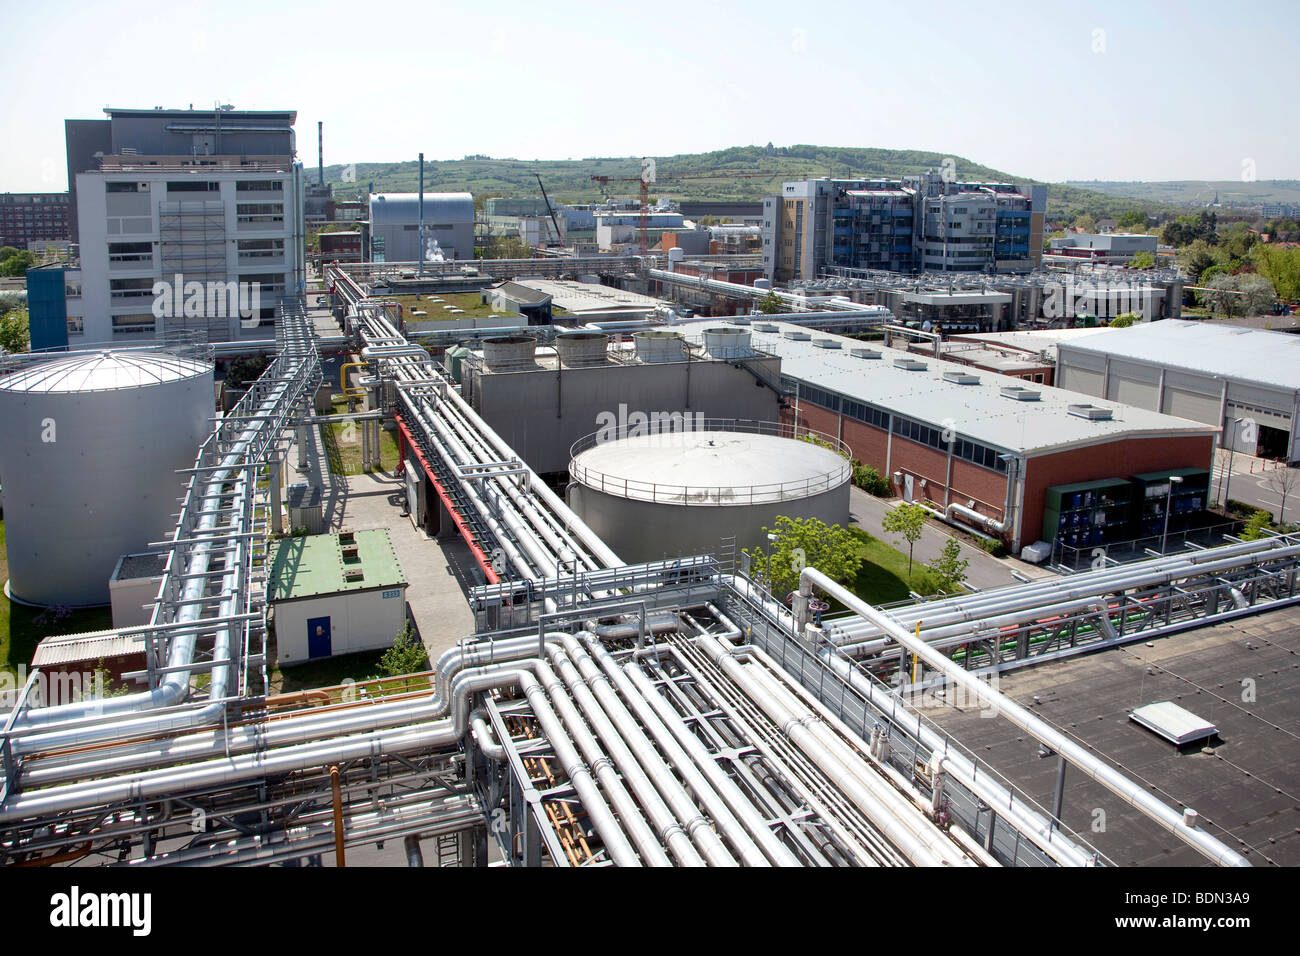 Sede della società farmaceutica Boehringer Ingelheim GmbH, Ingelheim, Renania-Palatinato, Germania, Europa Foto Stock